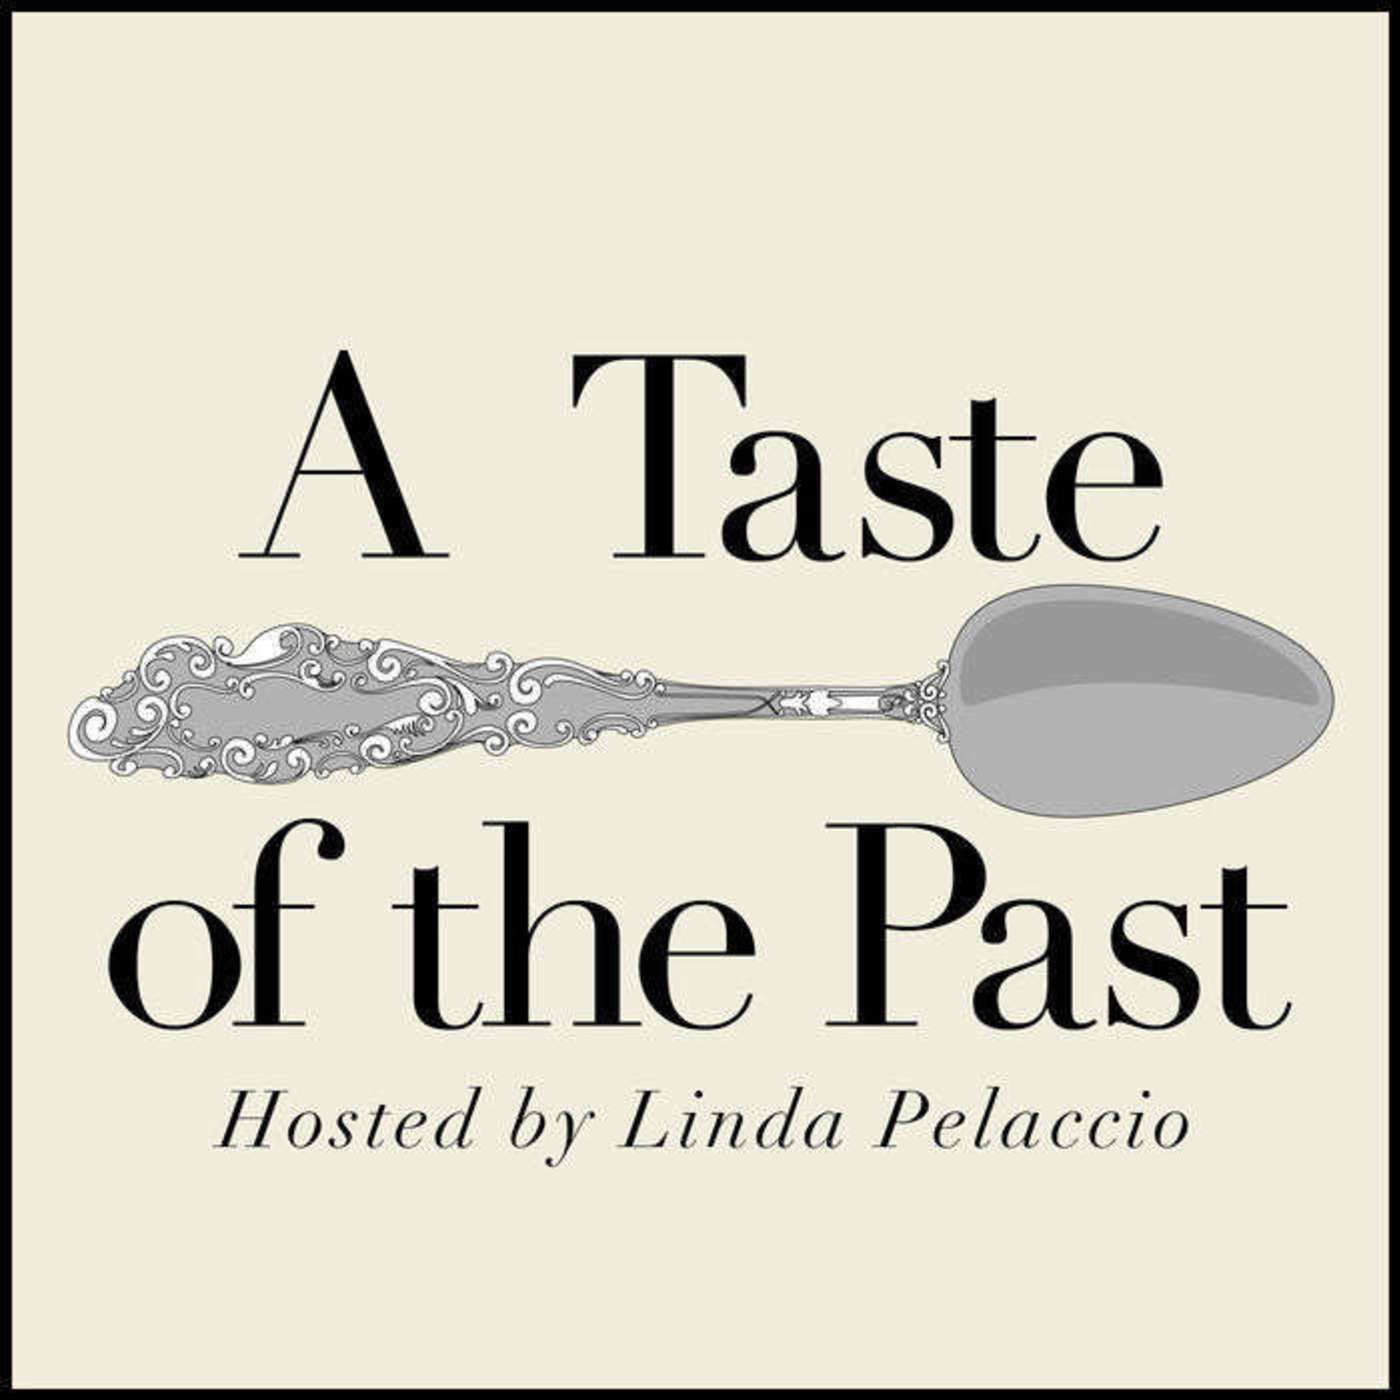 Episode 139: Darina Allen & Irish Traditional Cooking